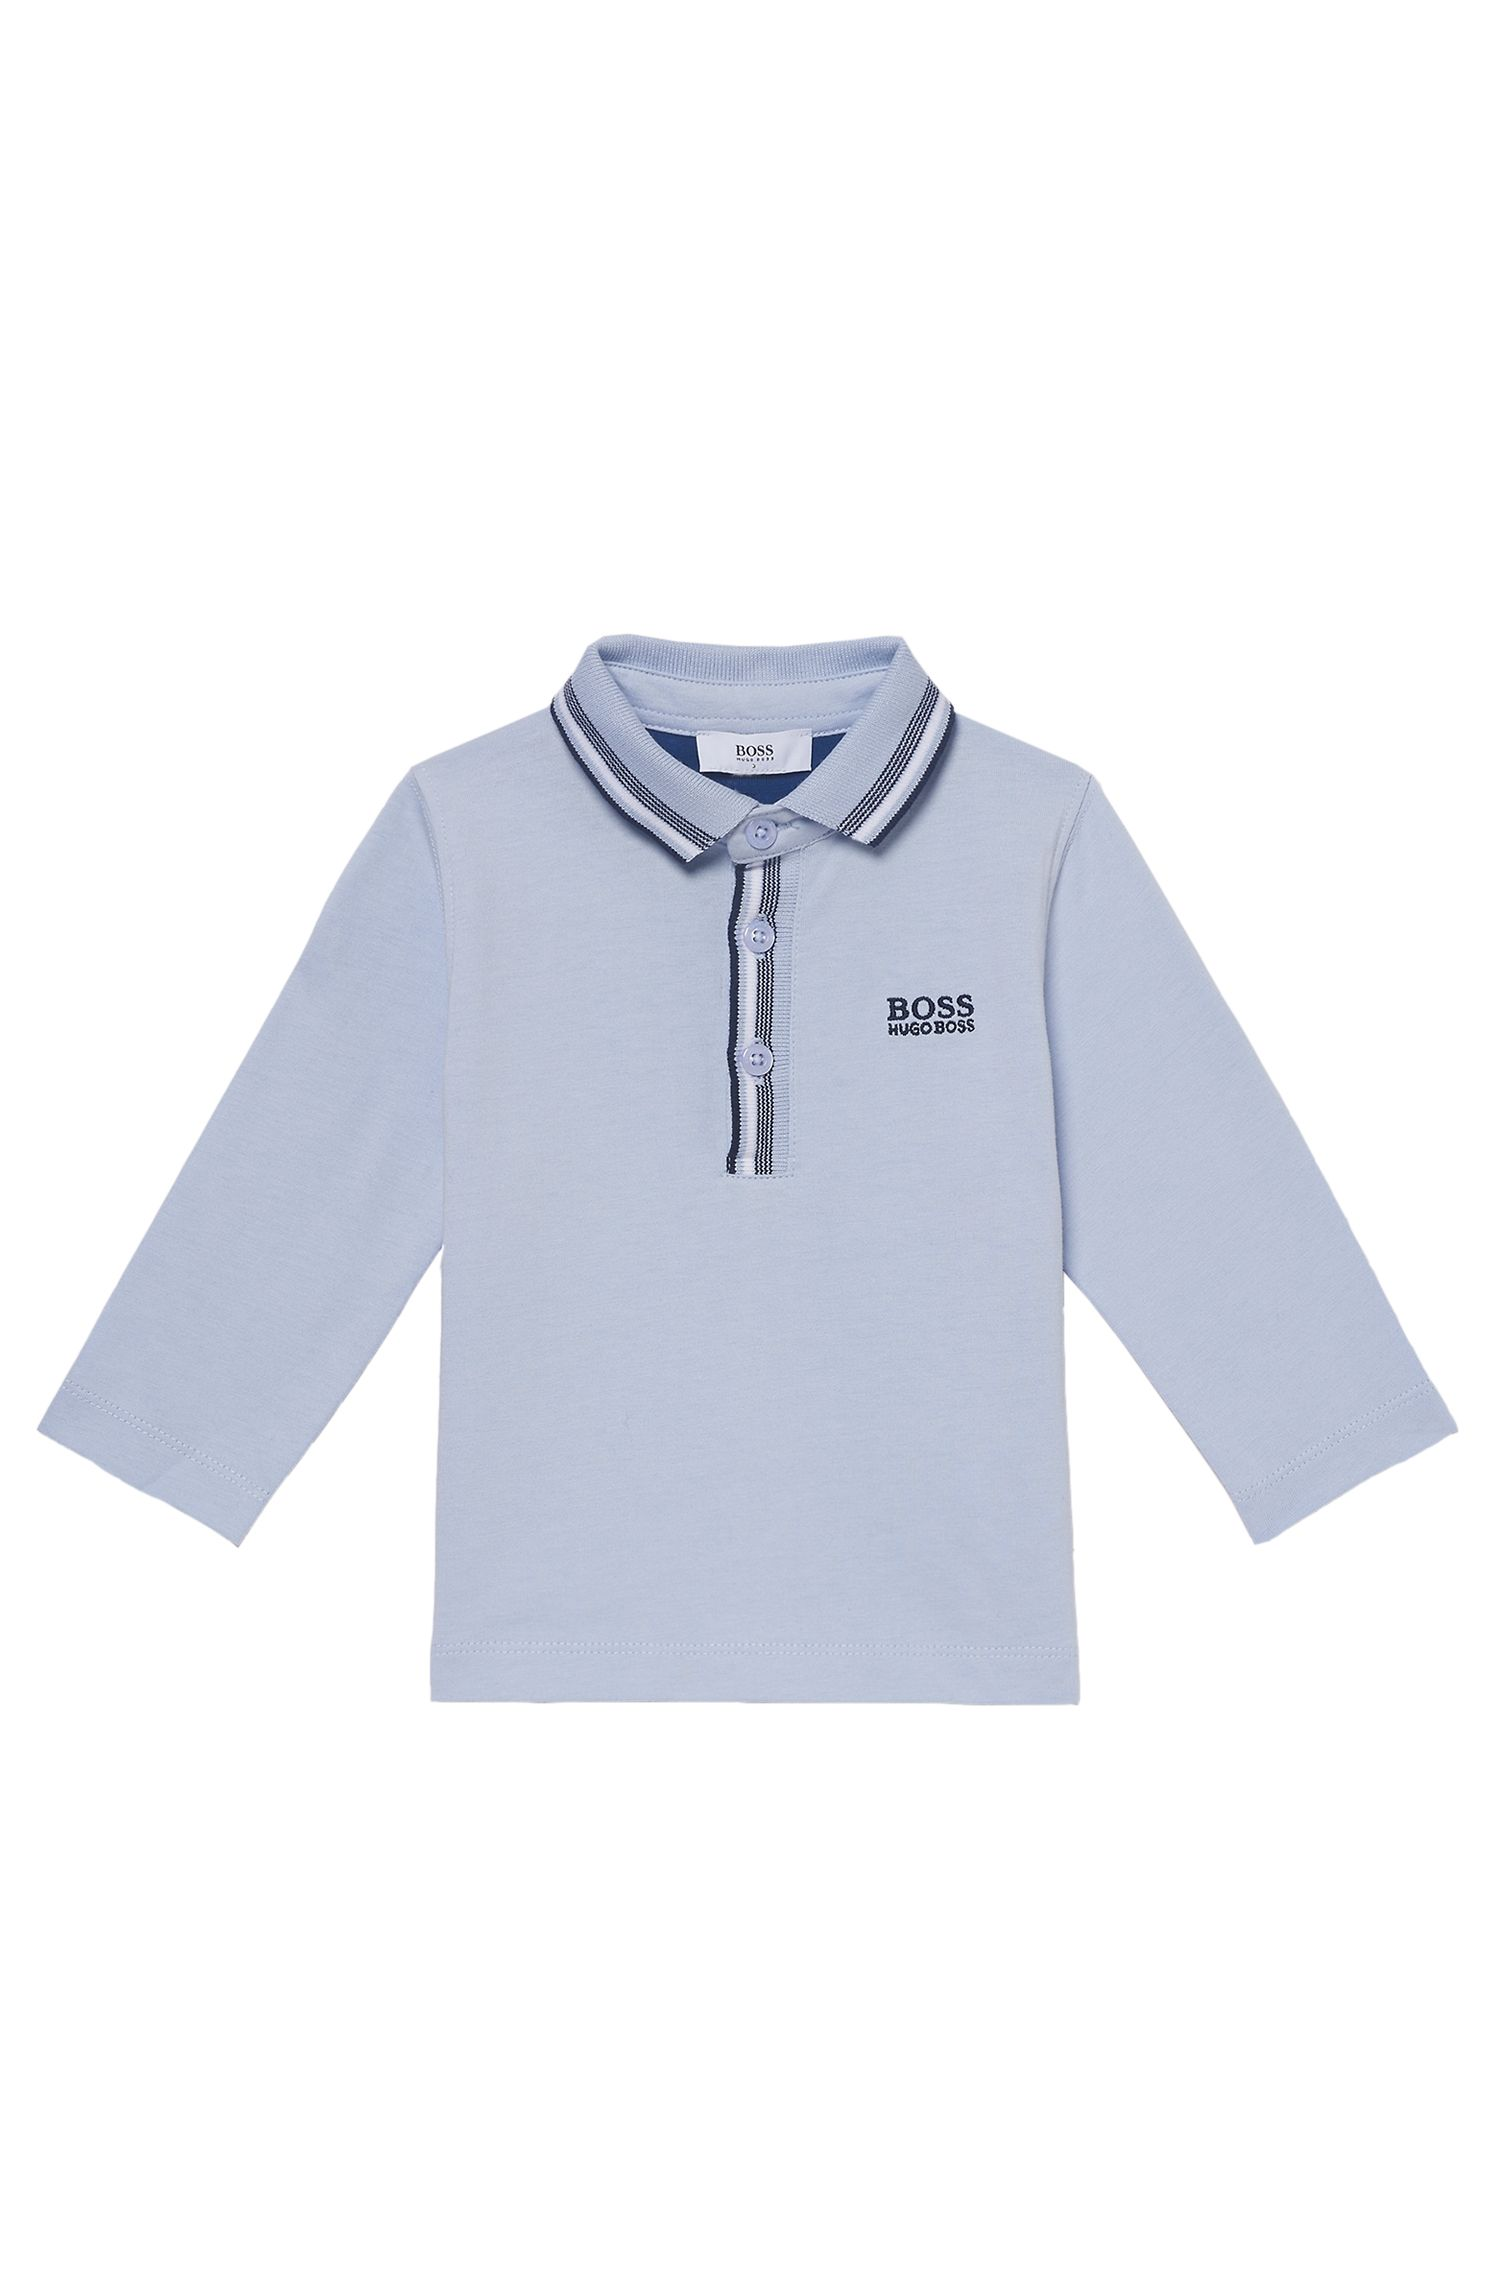 'J05500'   Toddler Stretch Cotton Blend Polo Shirt